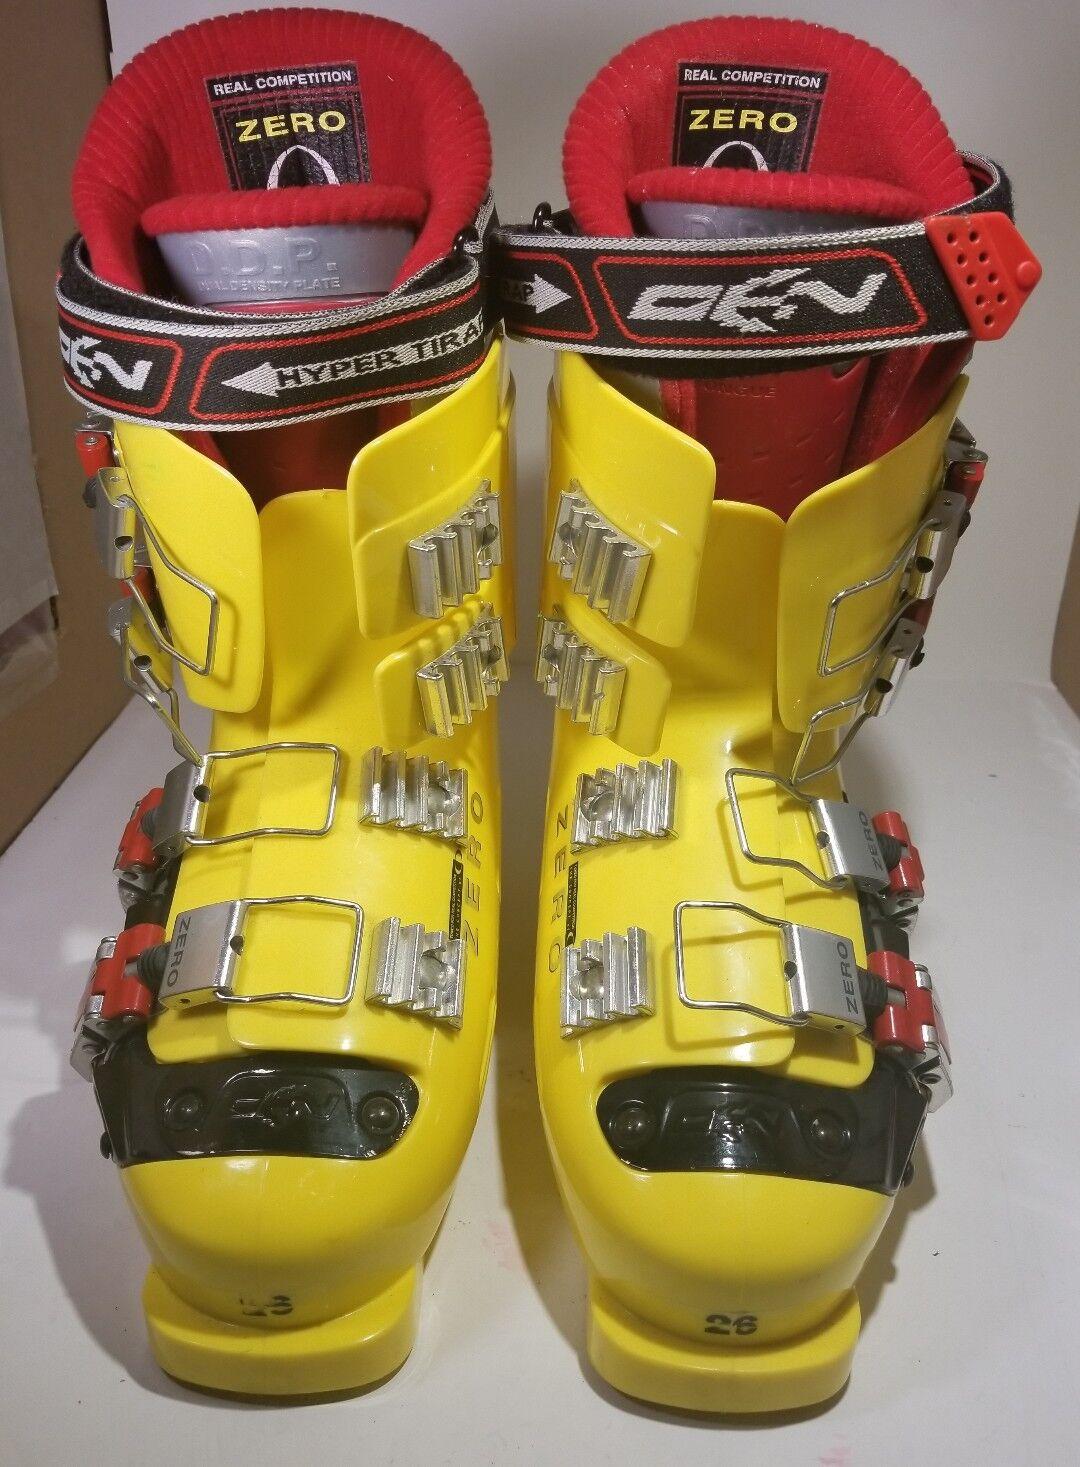 súper tila, real competencia cero botas de esquí, siete yardas.